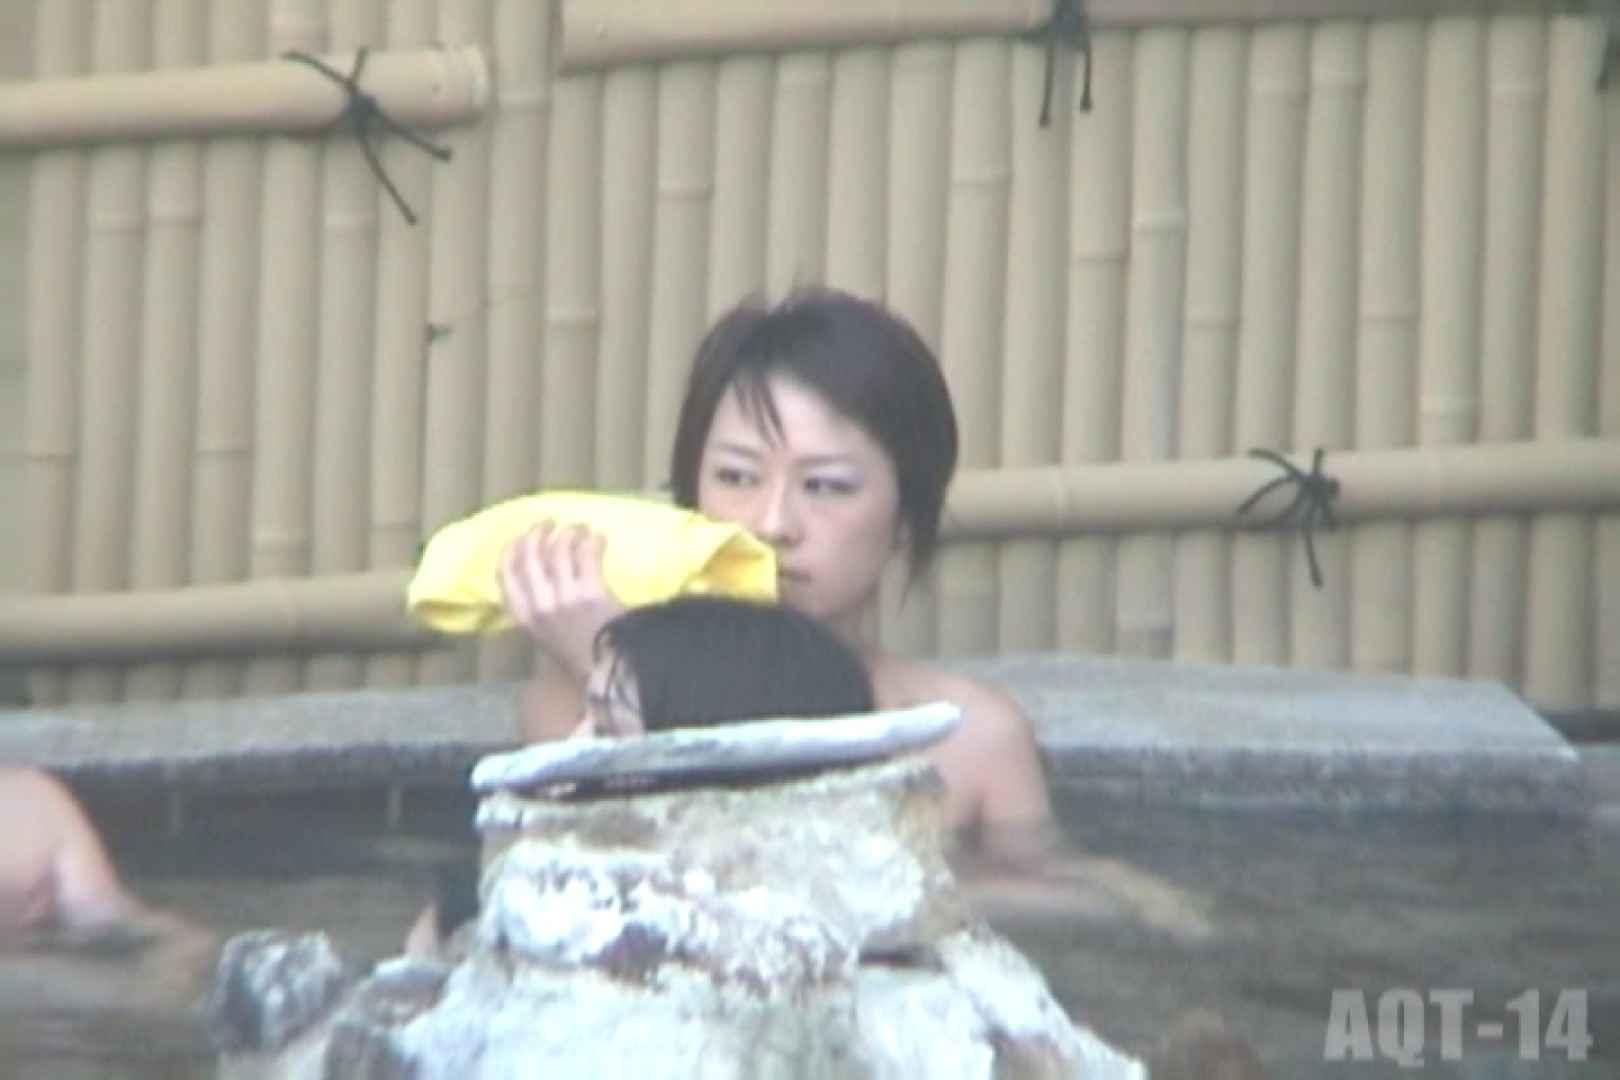 Aquaな露天風呂Vol.828 盗撮シリーズ | 露天風呂編  86PIX 39